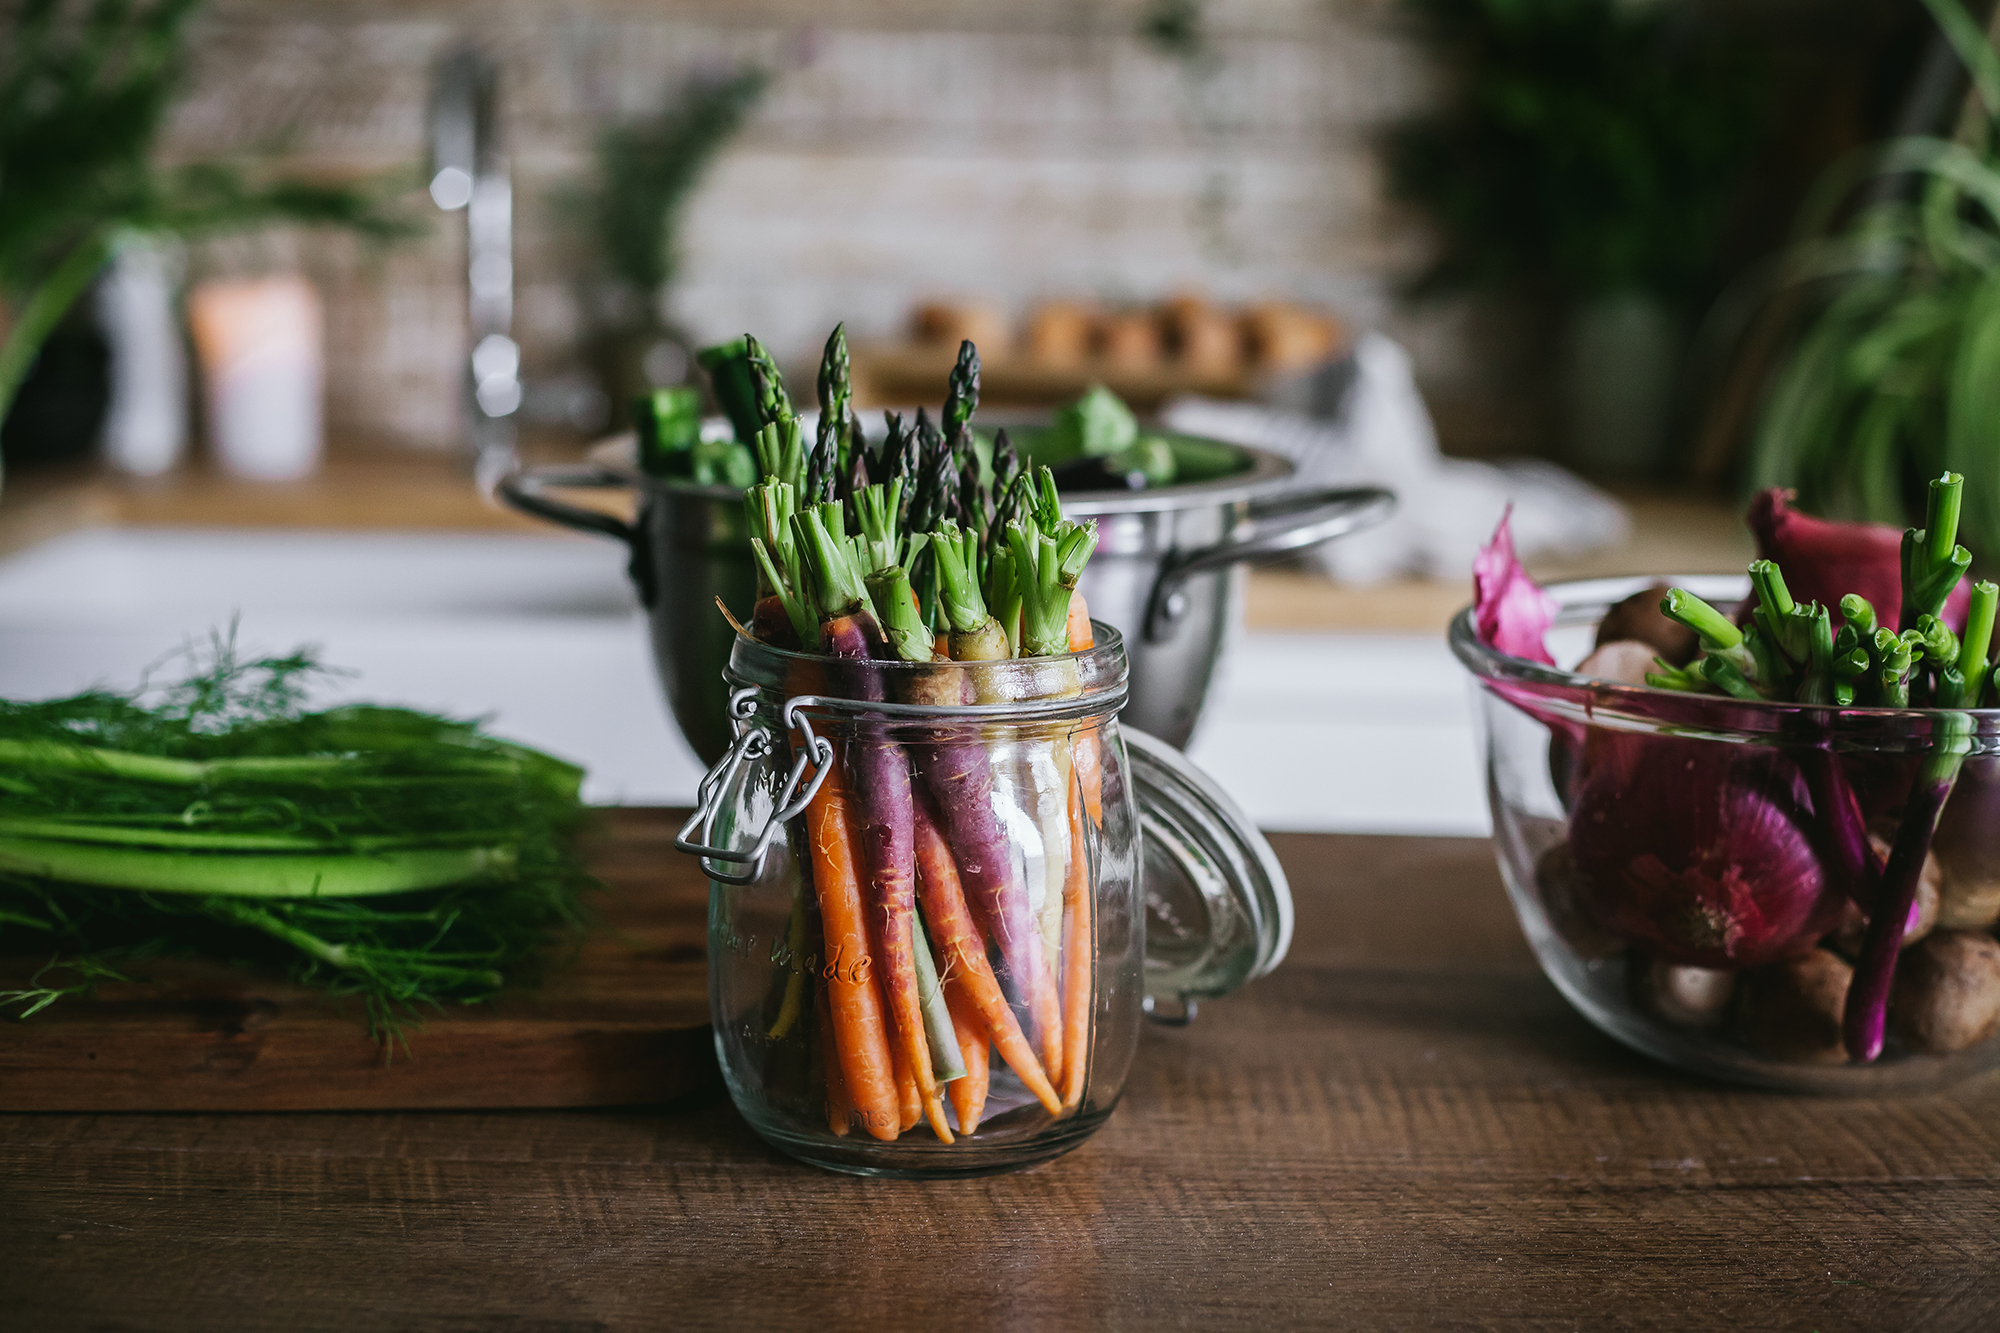 Sight+-+Veg+Salad+-+Kitchen+Shots-4286.jpg